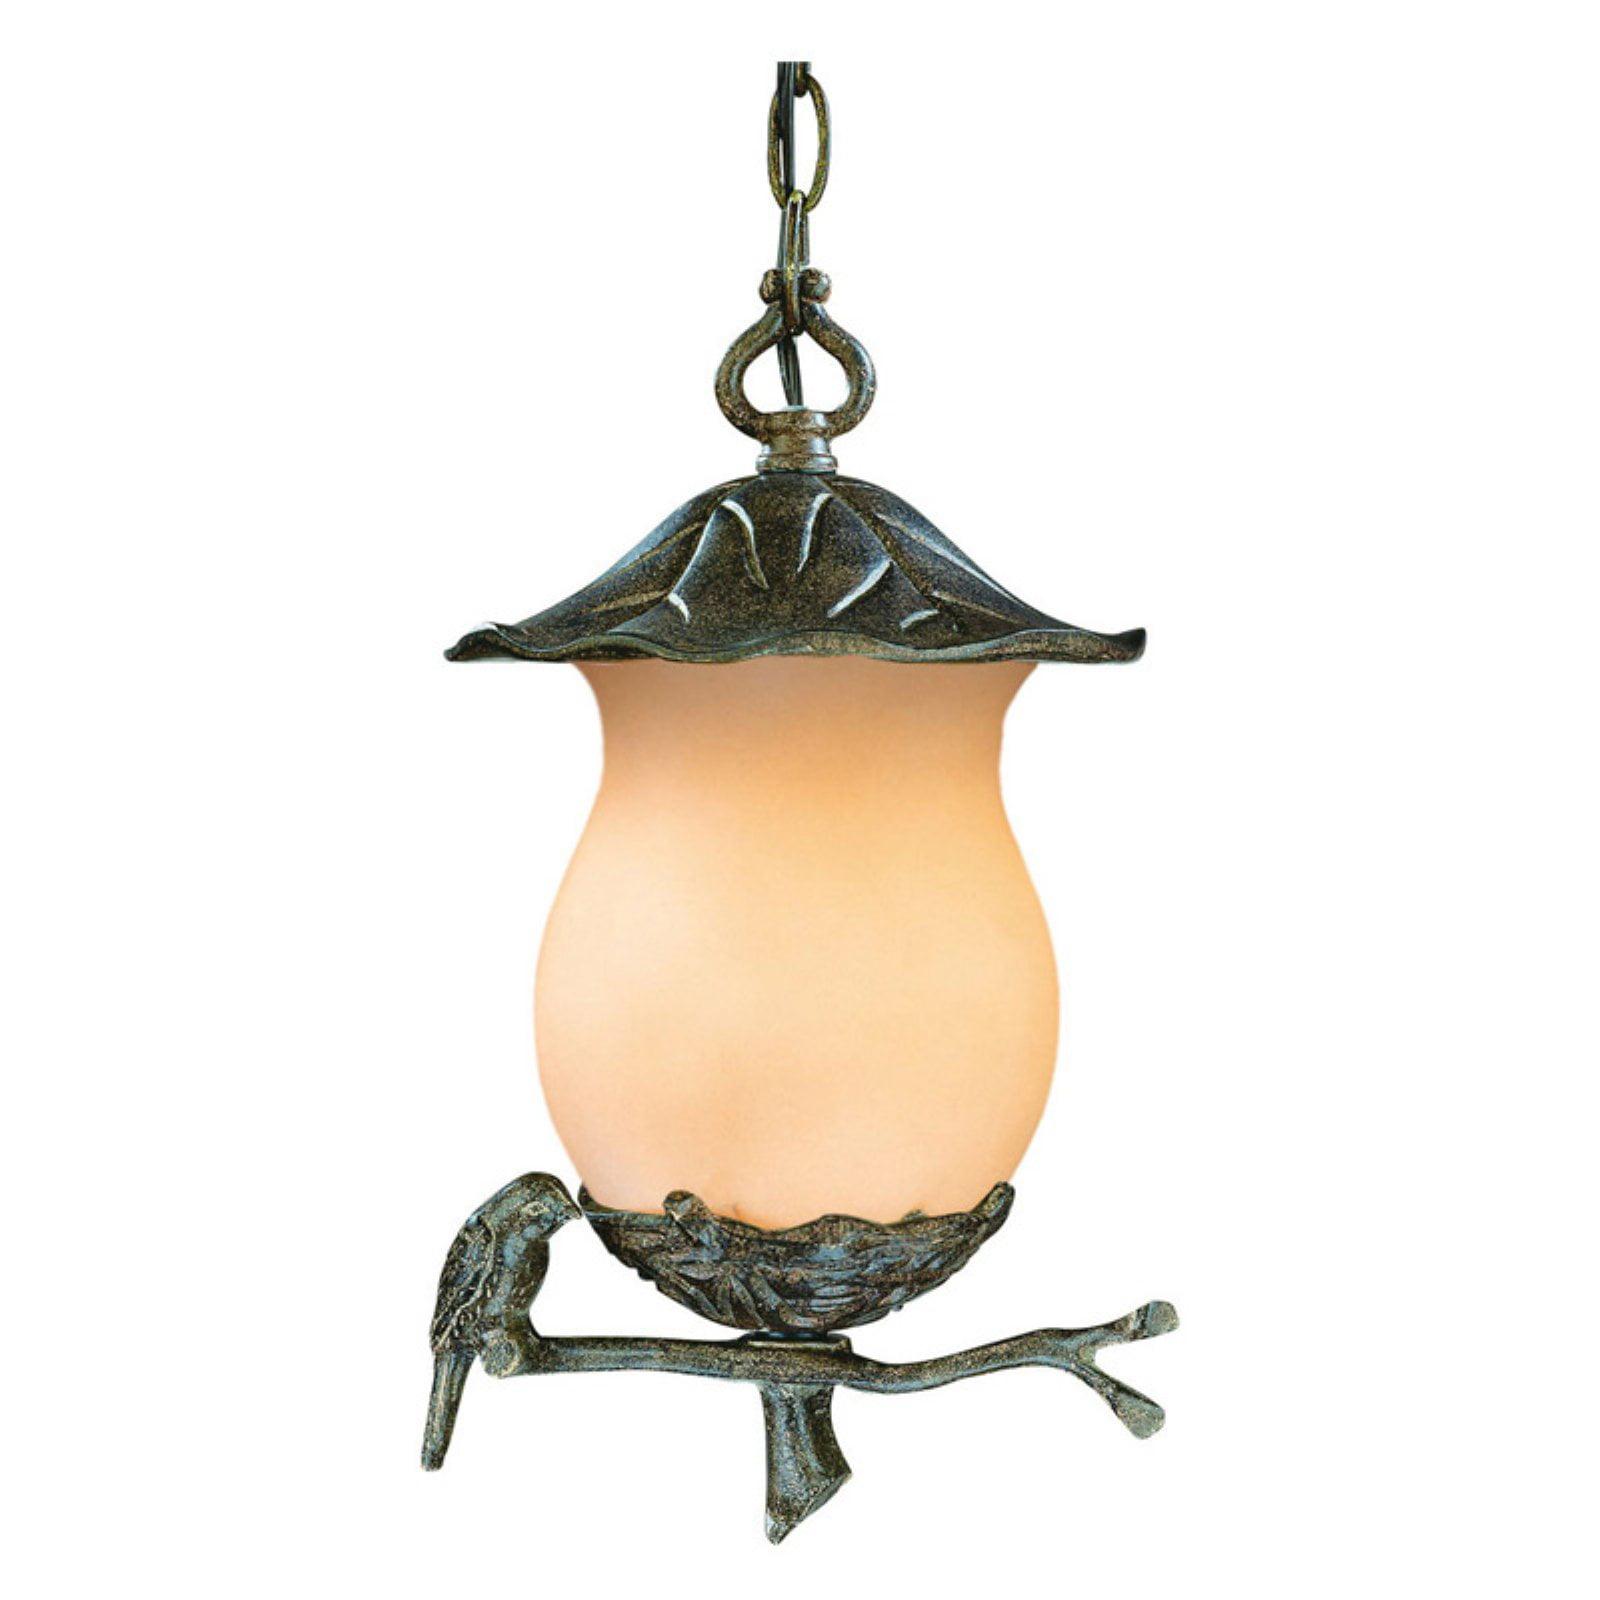 Acclaim Lighting Avian Outdoor Hanging Lantern Light Fixture by Acclaim Lighting